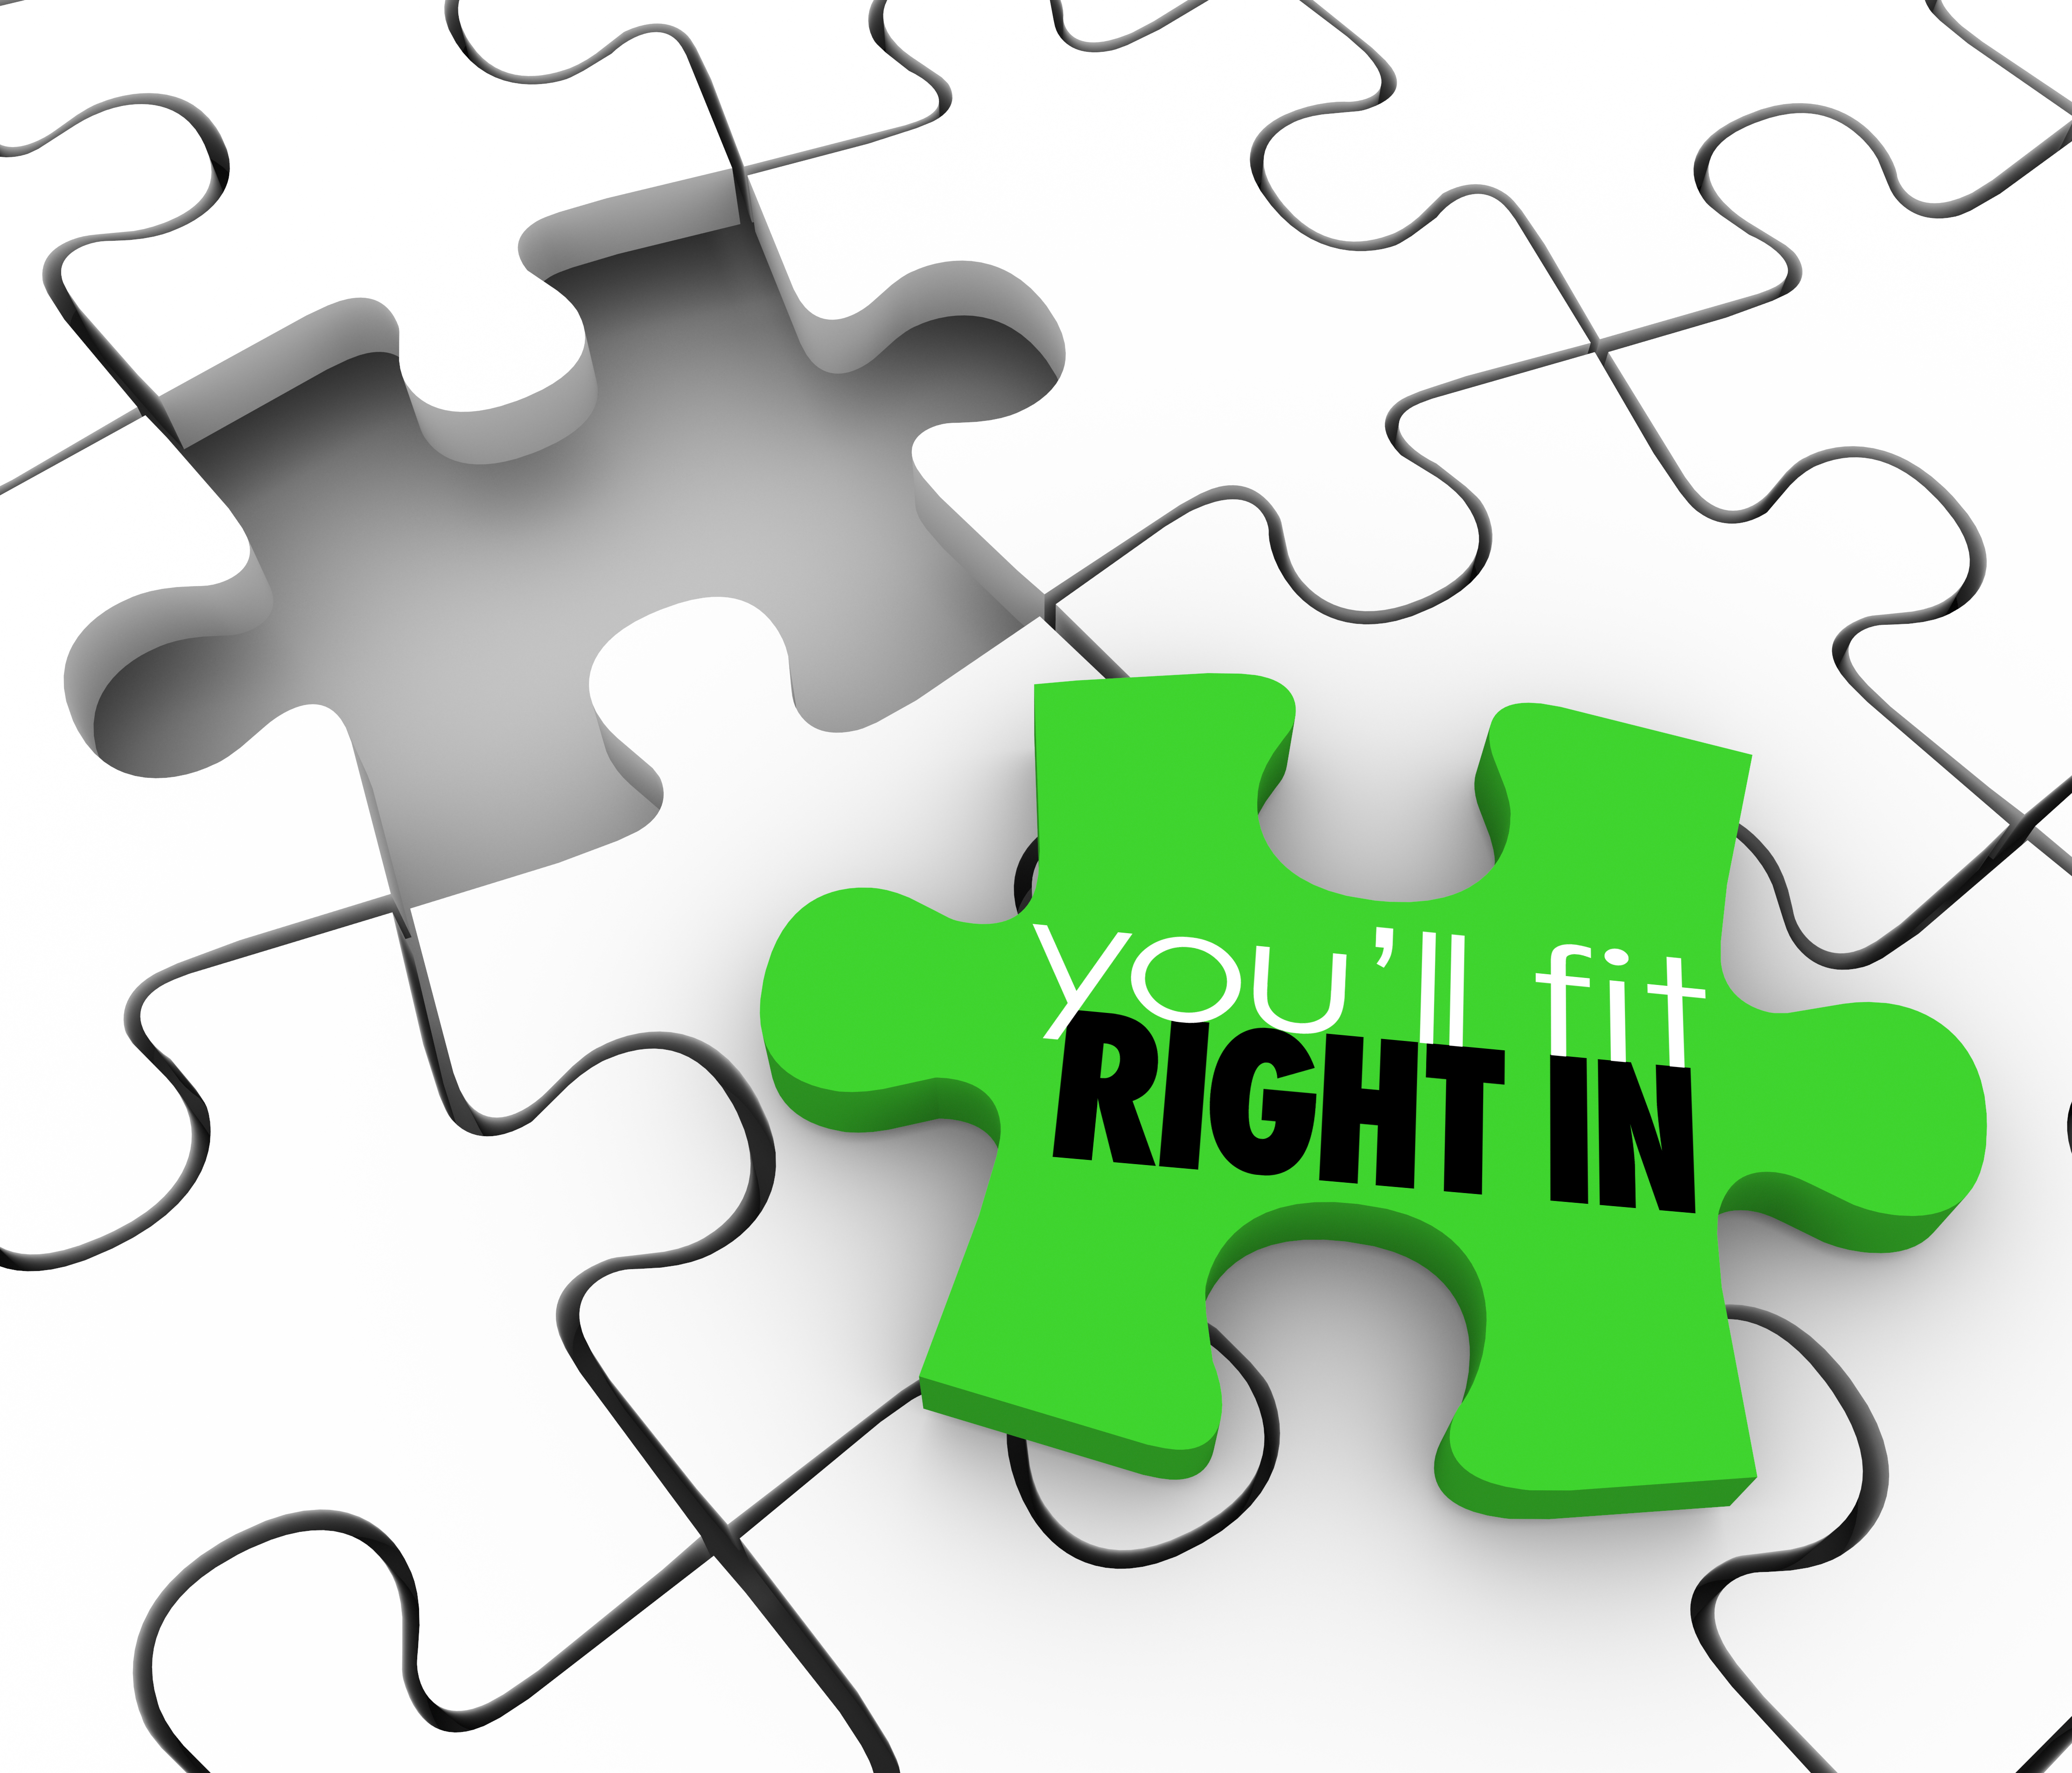 Puzzle clipart organization skills #9